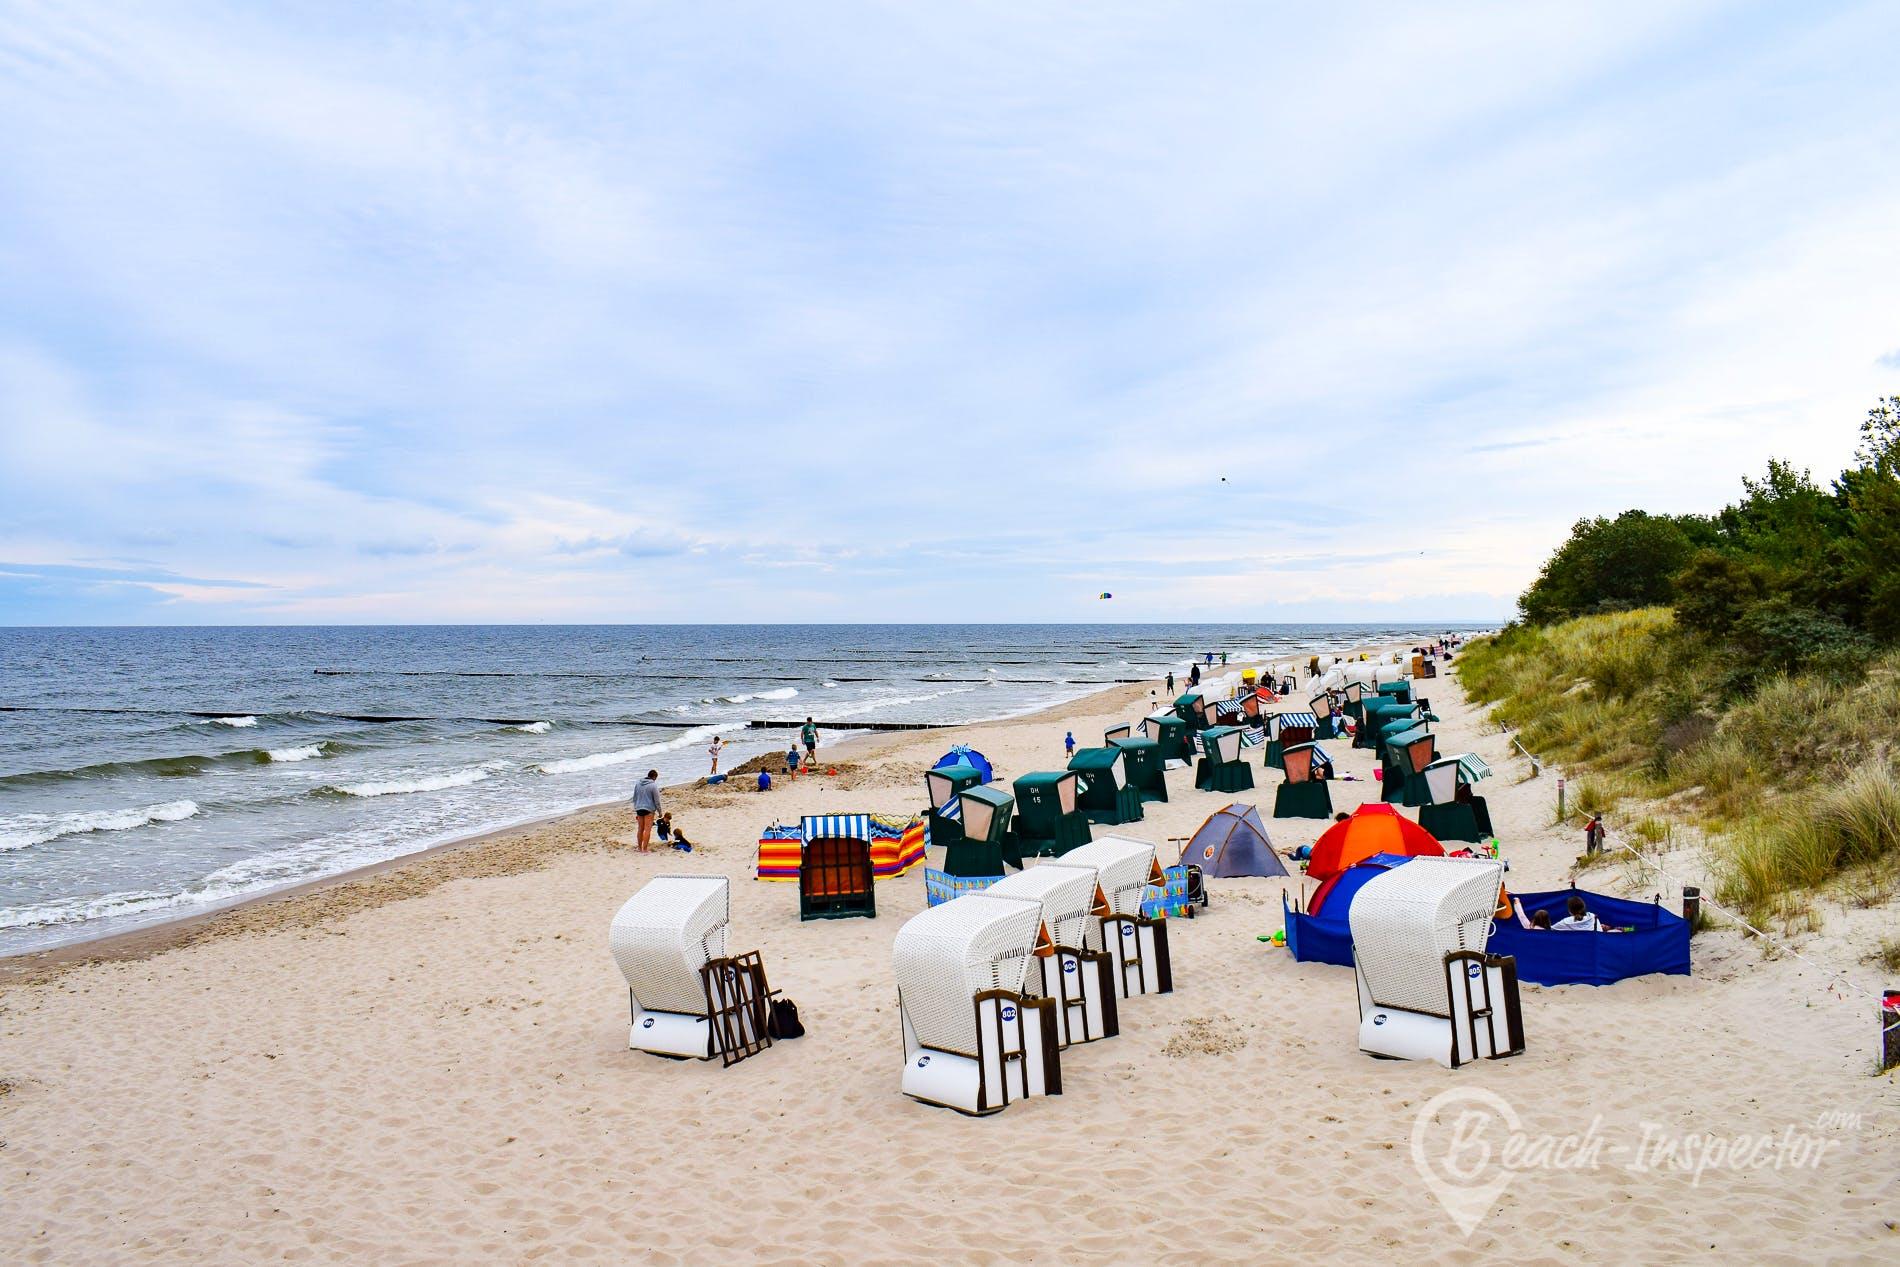 Strand Seebad Zempin, Usedom, Deutschland